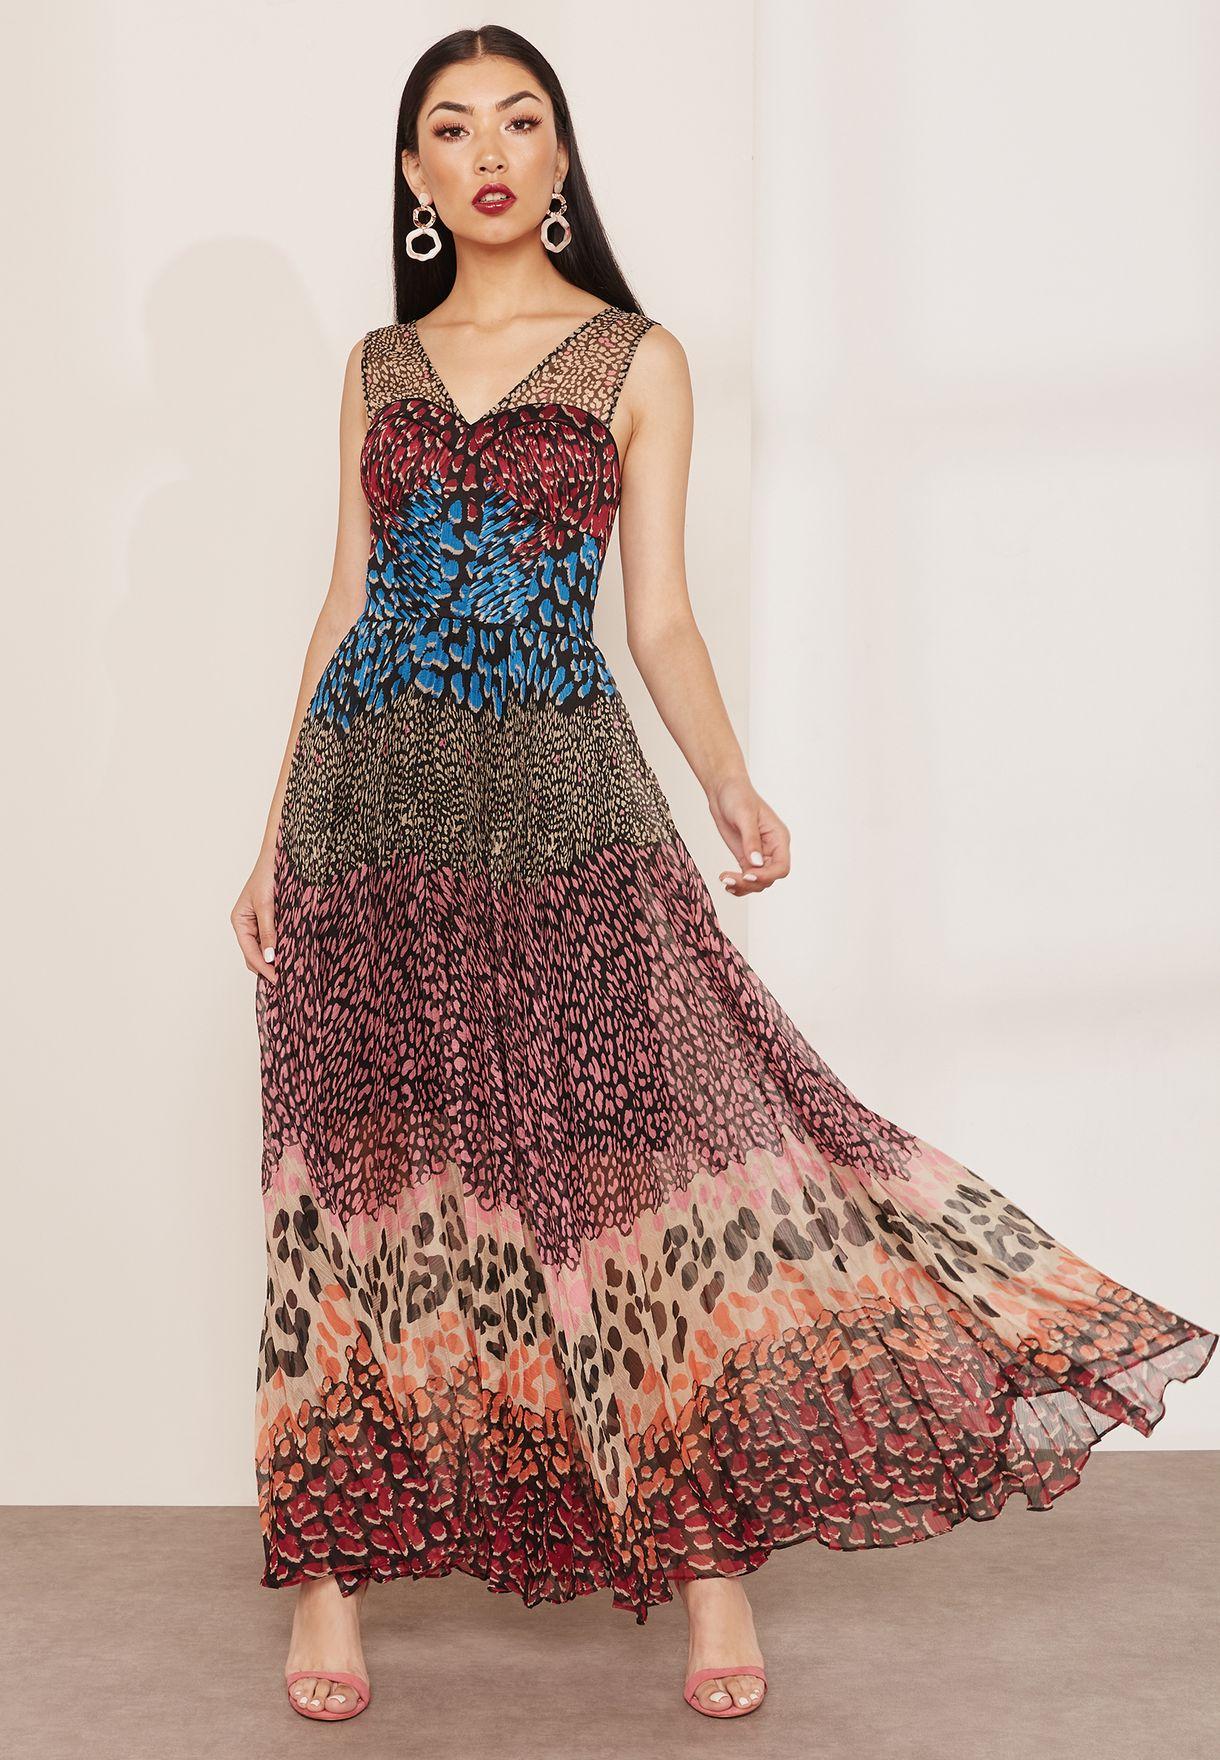 50f4d7015c59 Shop Karen Millen prints Colourblock Leopard Print Pleated Dress ...